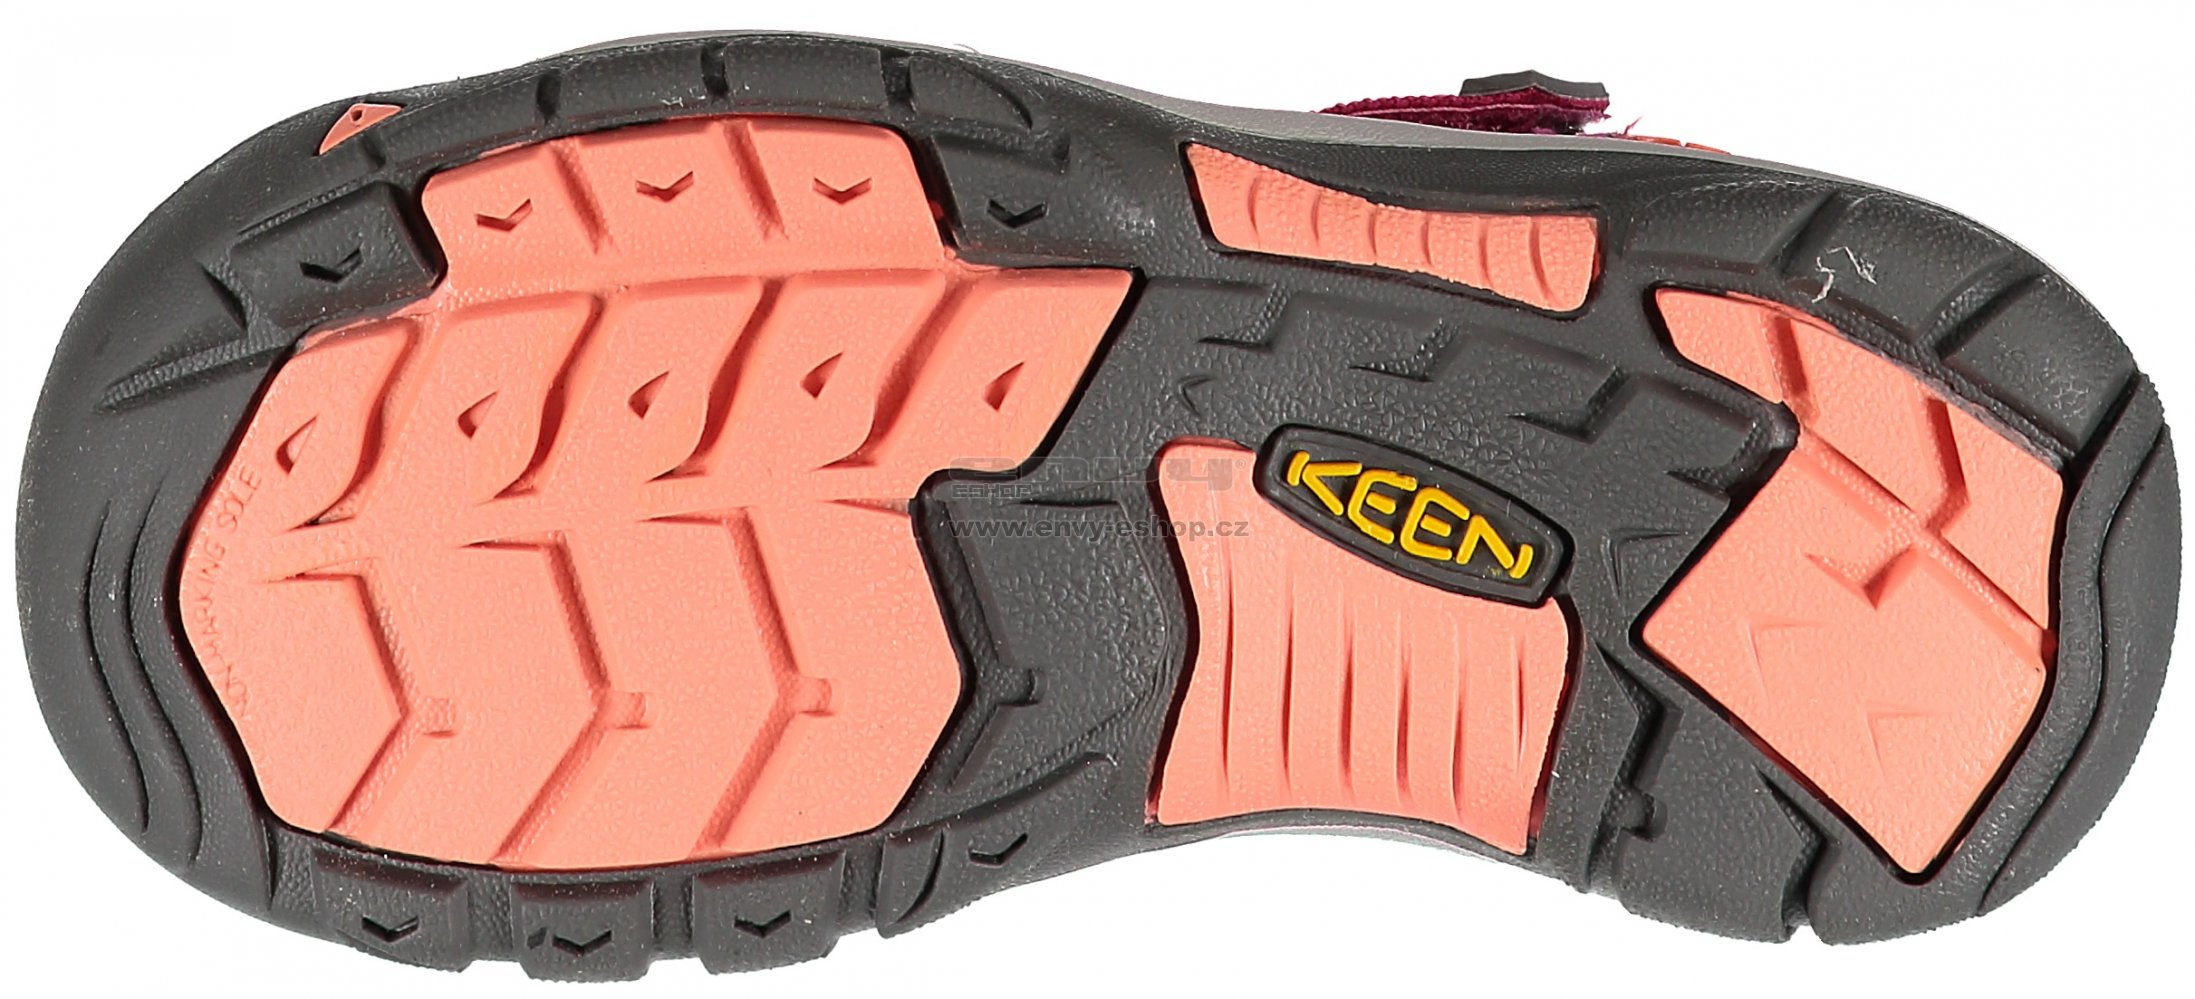 Dětské sandále KEEN NEWPORT H2 JR VERY BERRY FUSION CORAL velikost ... 7904ffc8a0c